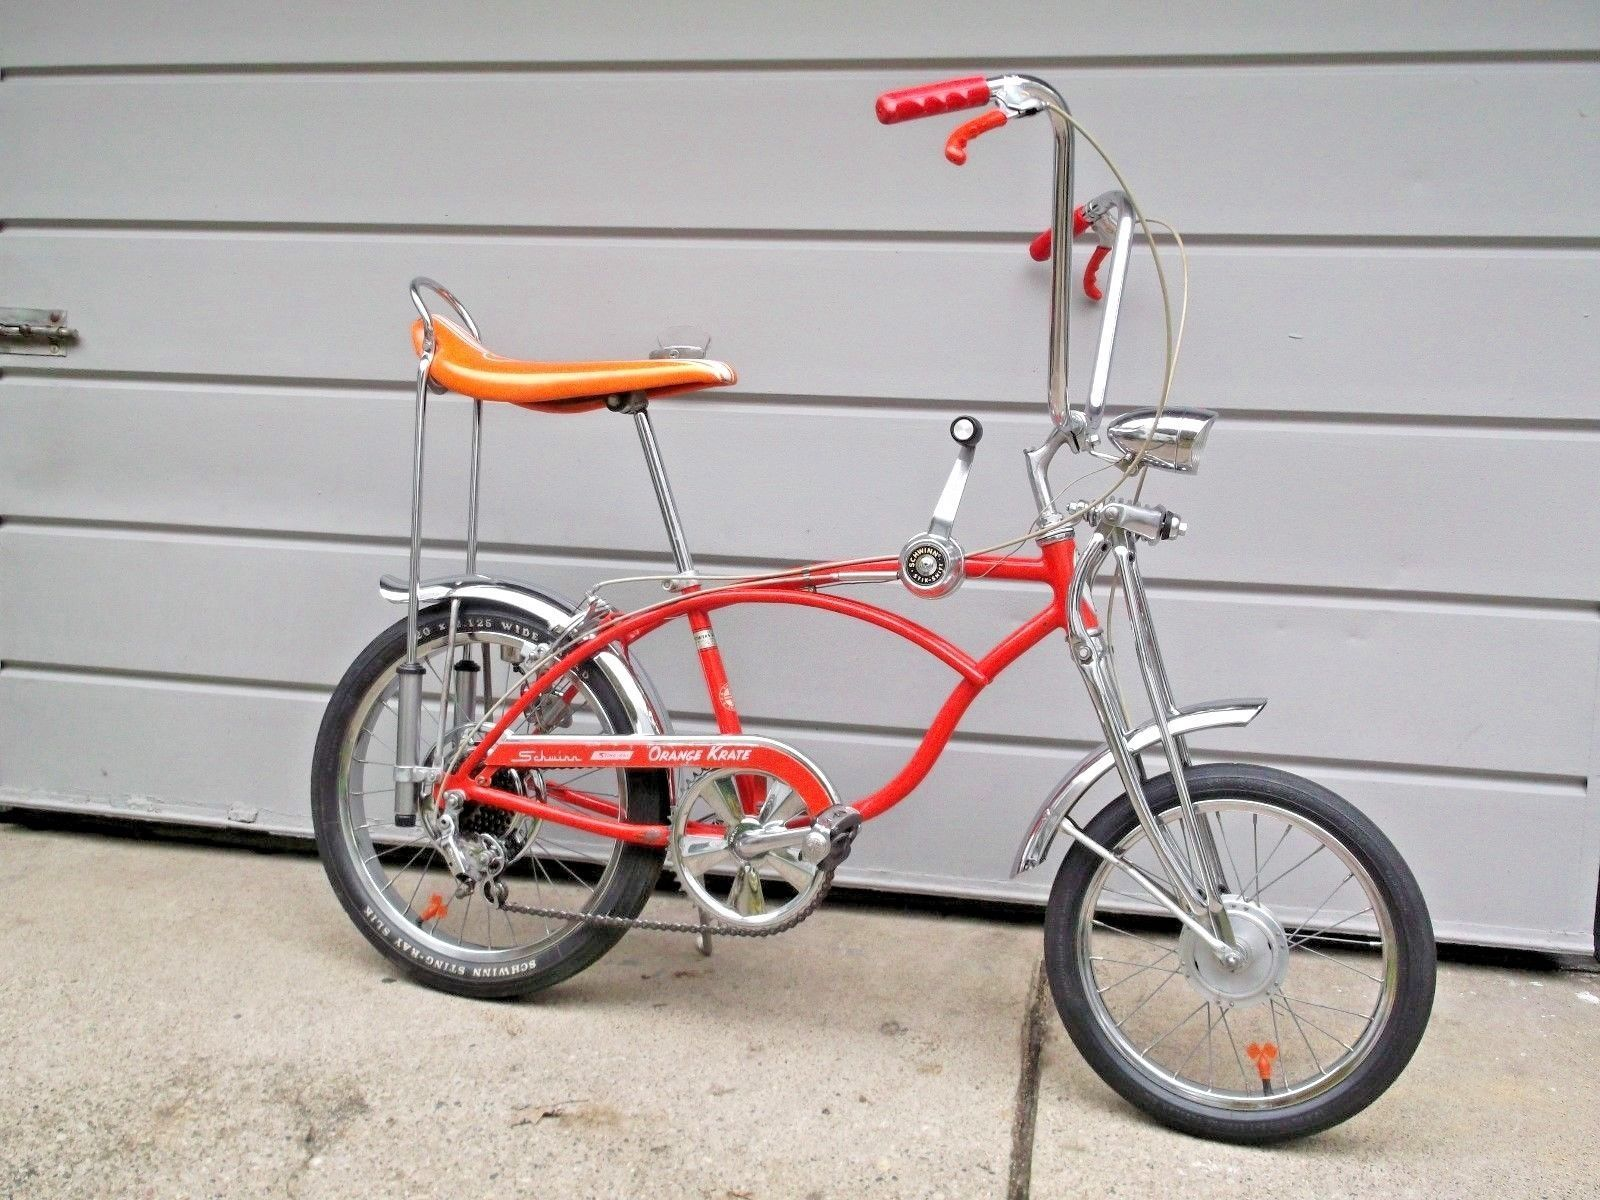 1969 Schwinn Orange Krate Sting Ray Bicycle 5 Speed Bike Ebay Schwinn Speed Bike Bicycle